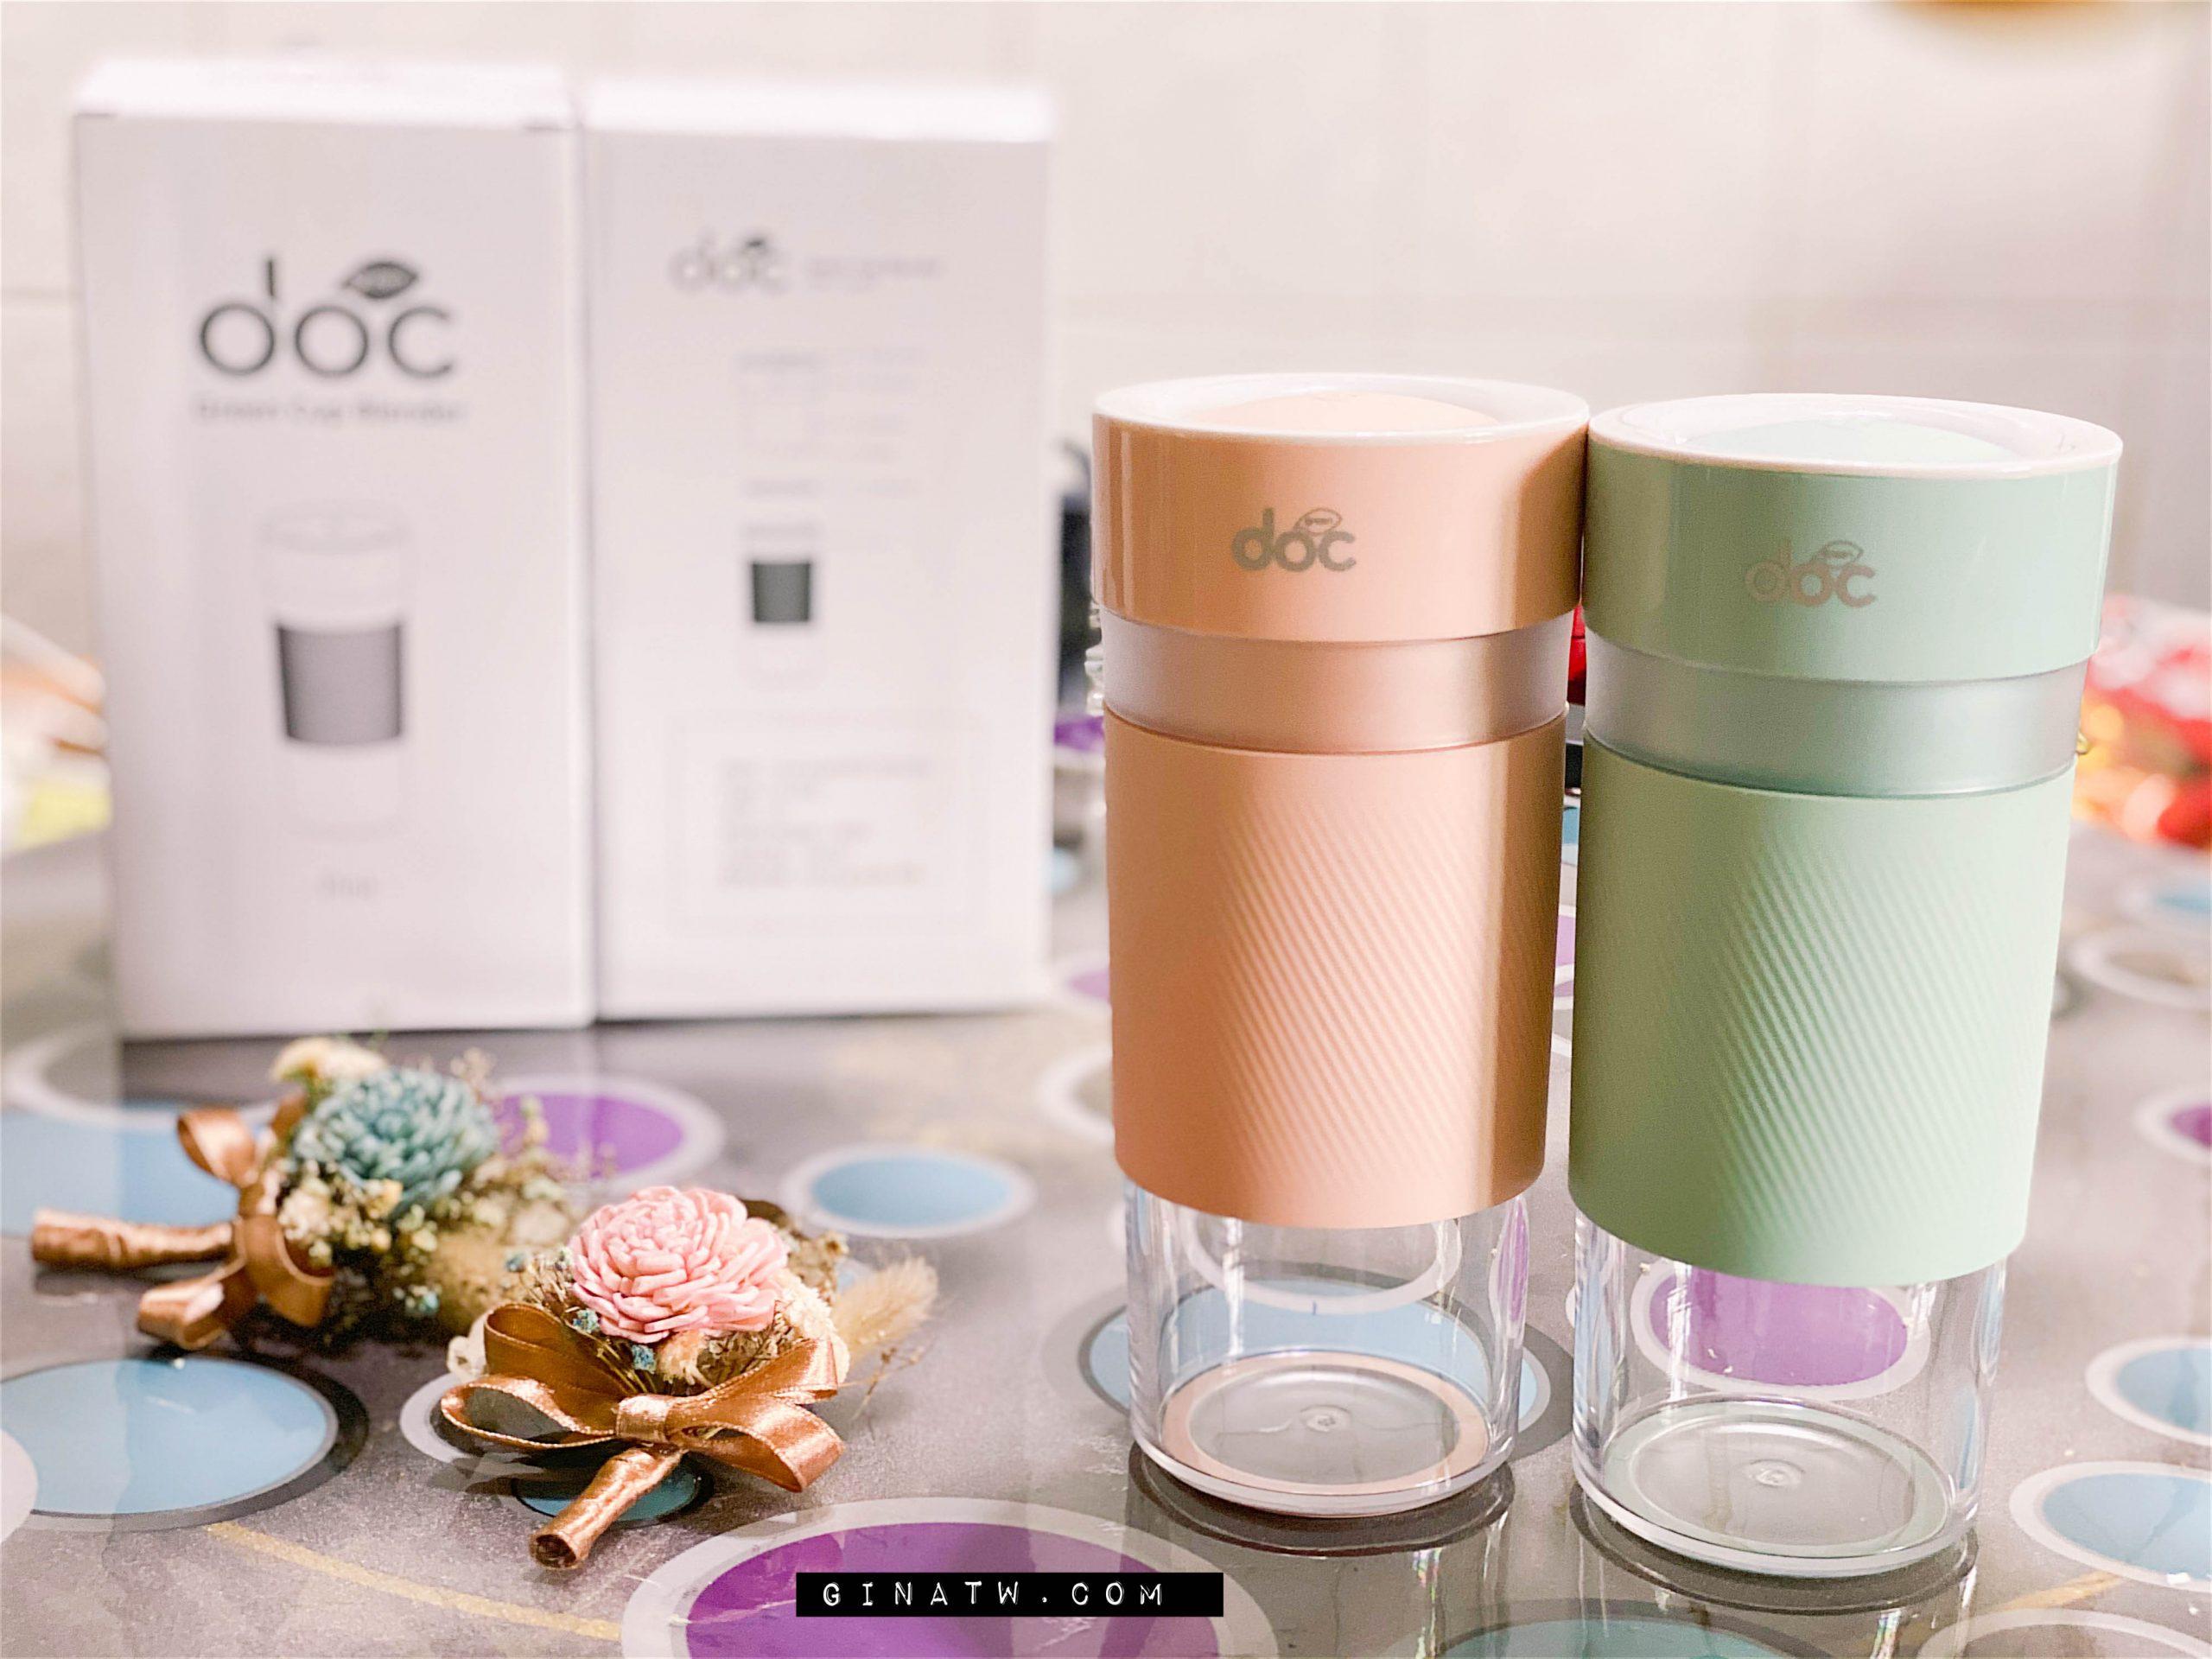 【DOC果汁機輕享杯】奧地利Green Cup隨行杯果汁機團購|時尚質感USB充電 @GINA環球旅行生活